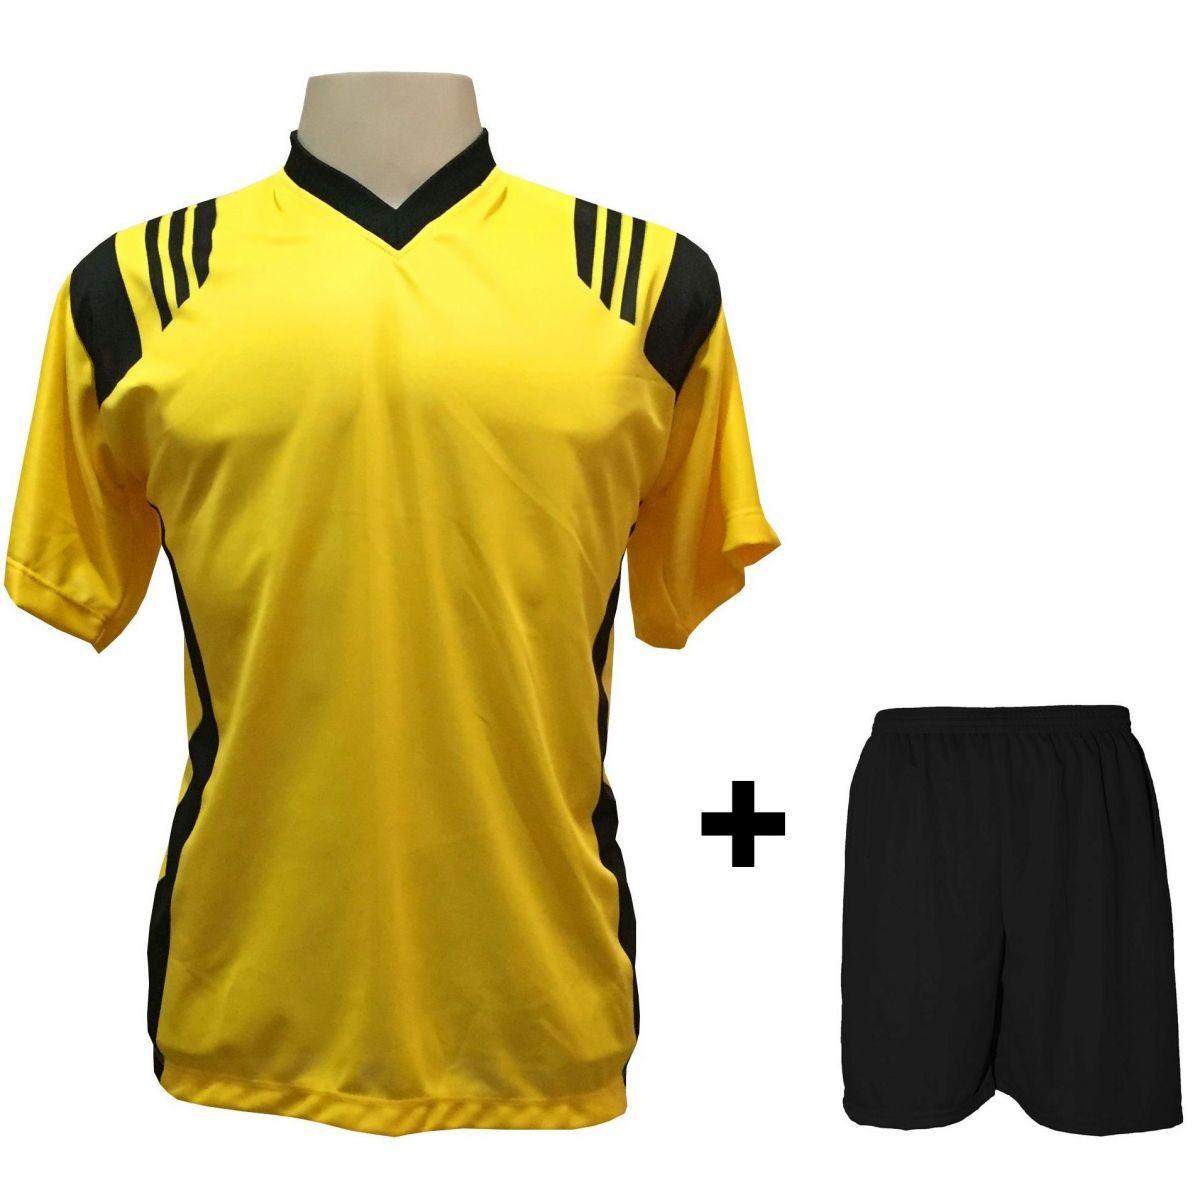 Camisas de Futebol 21b39c38d7b87